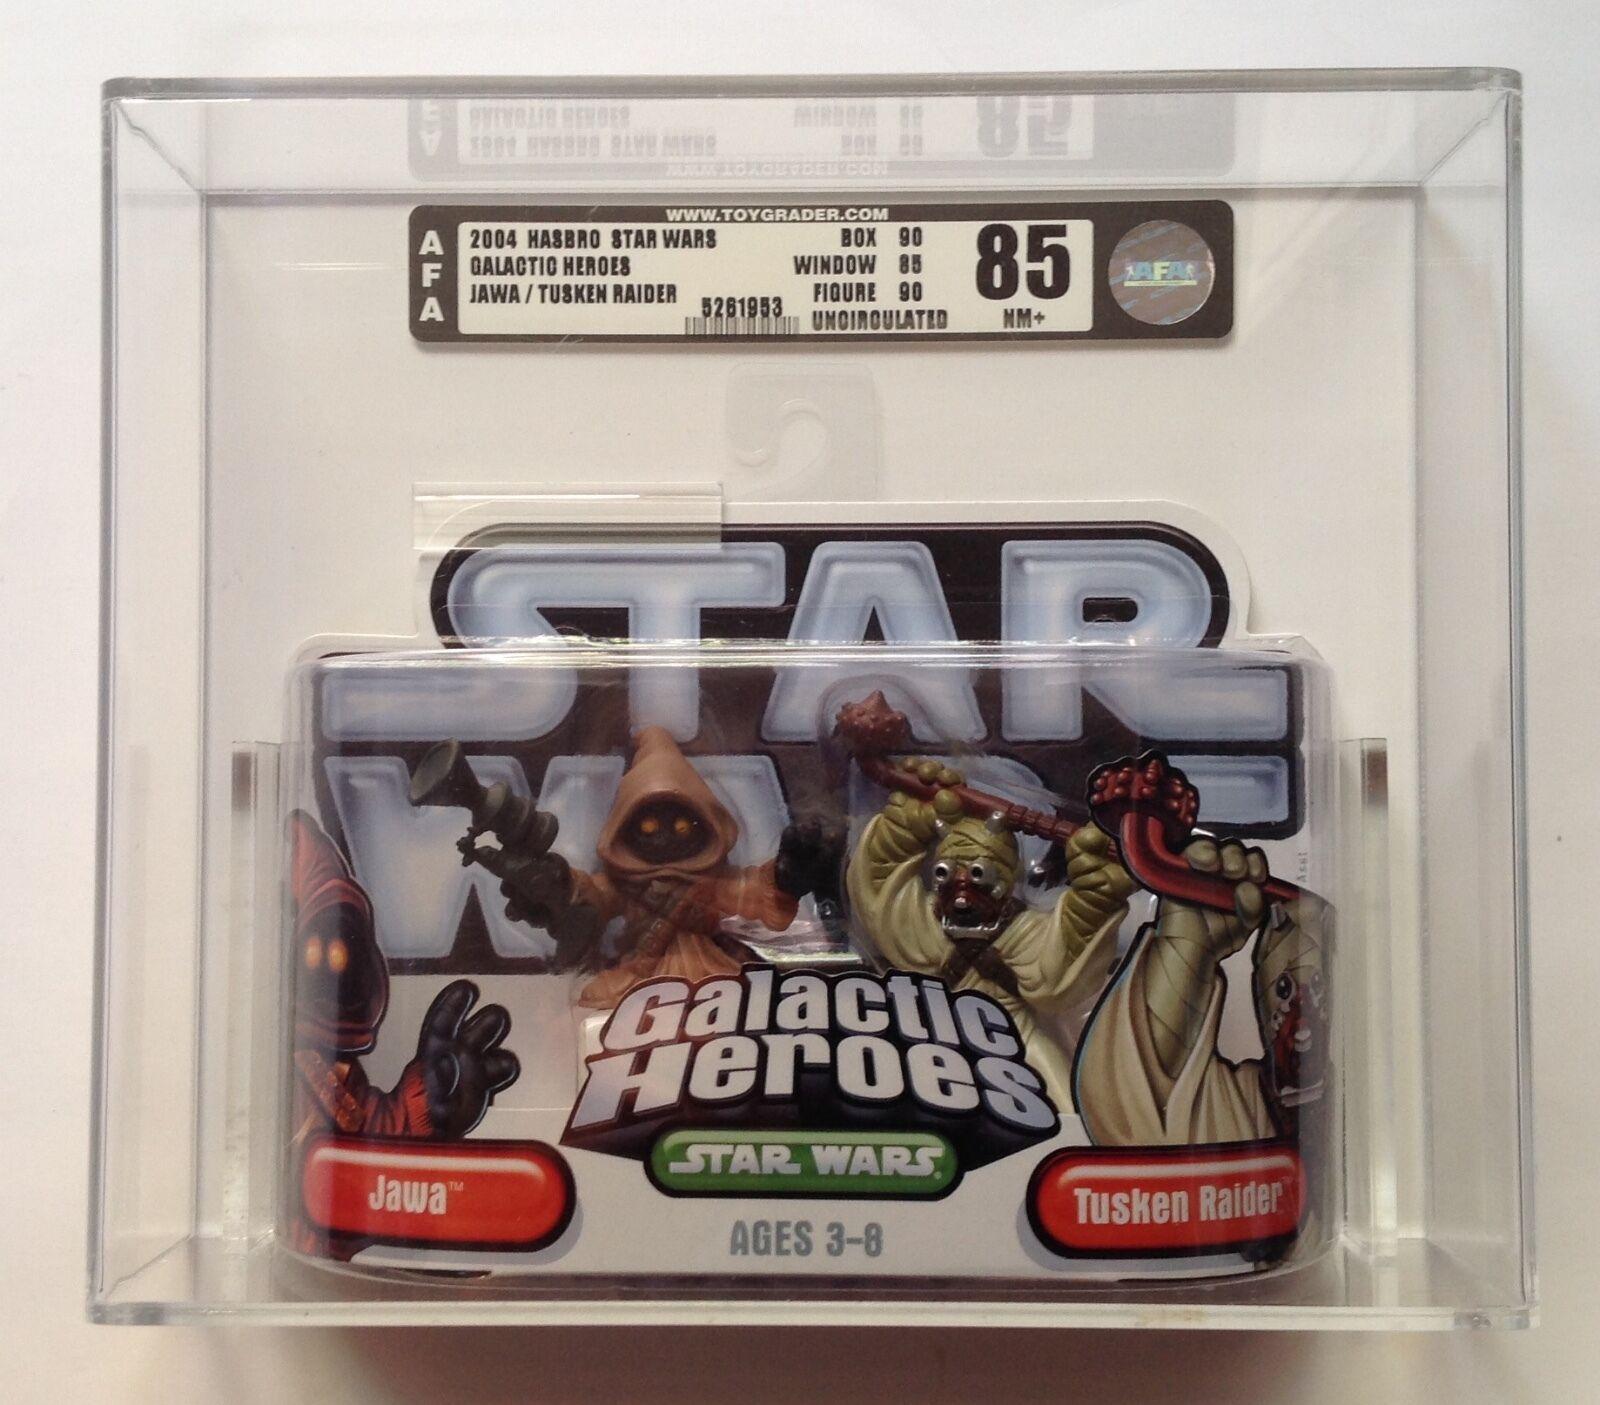 Star Wars Galactic Heroes Jawa and Tusken Raider AFA U85 NM+ Hasbro 2004